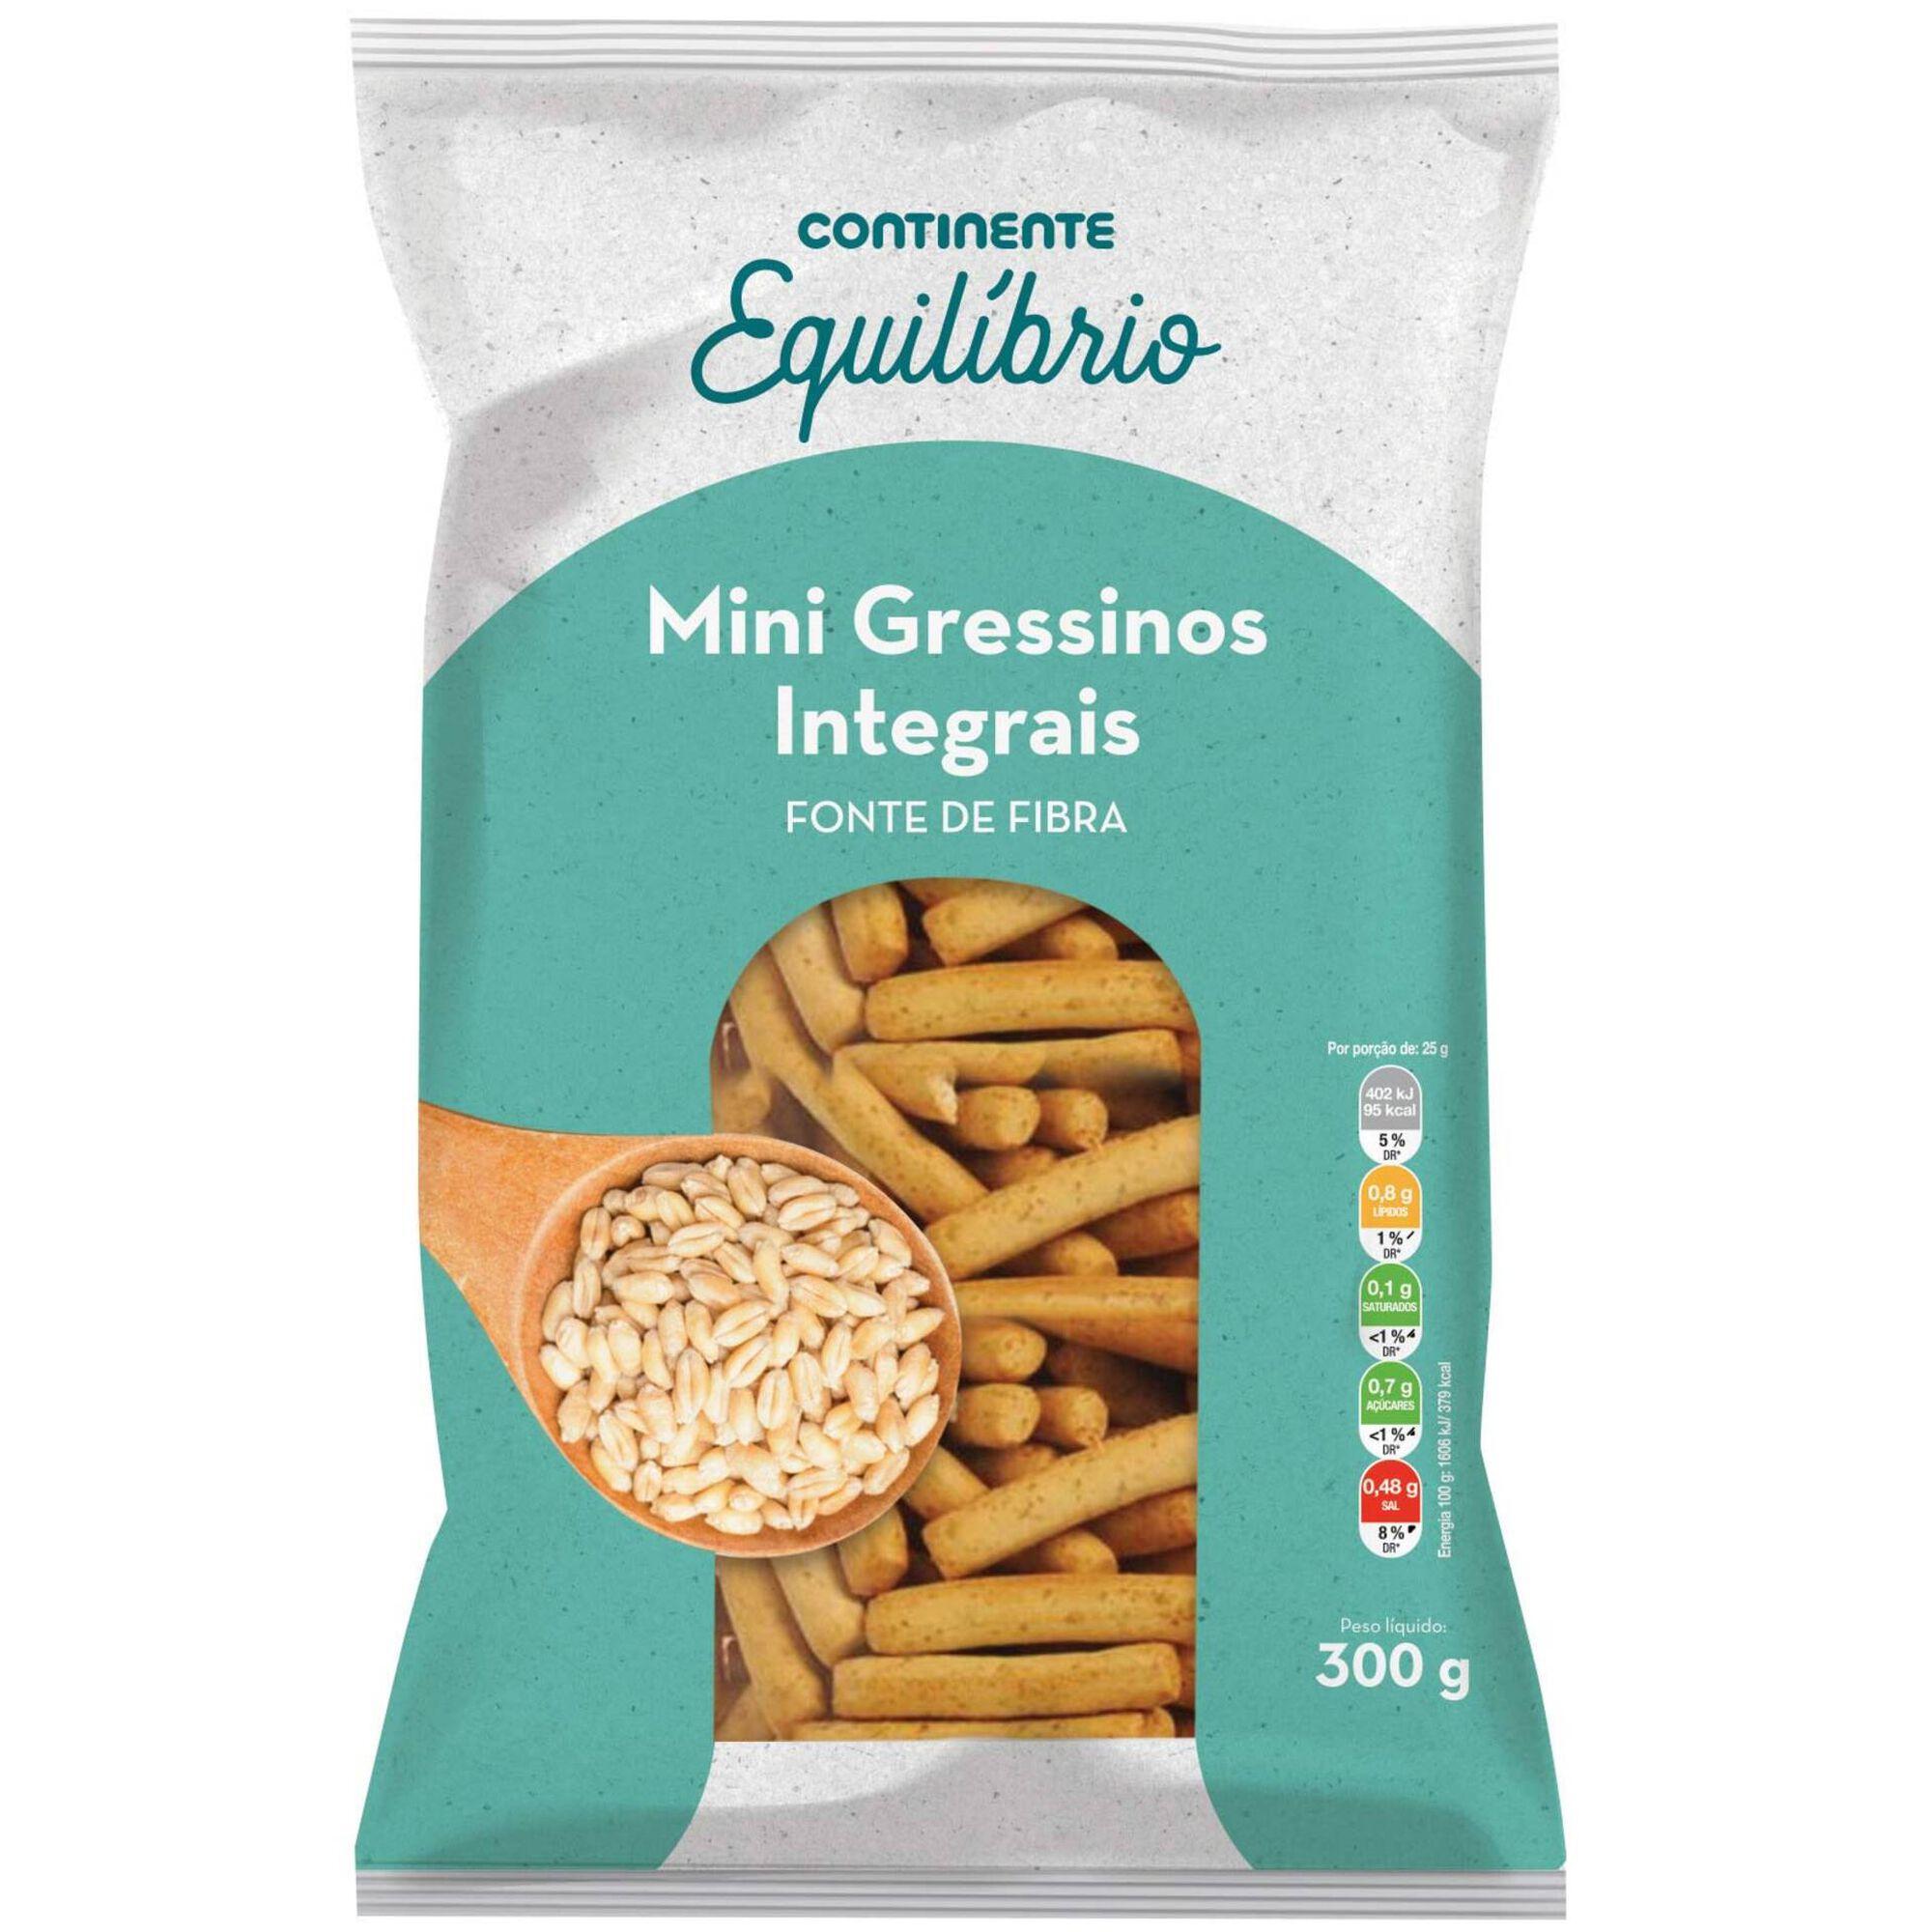 Mini Gressinos Integrais